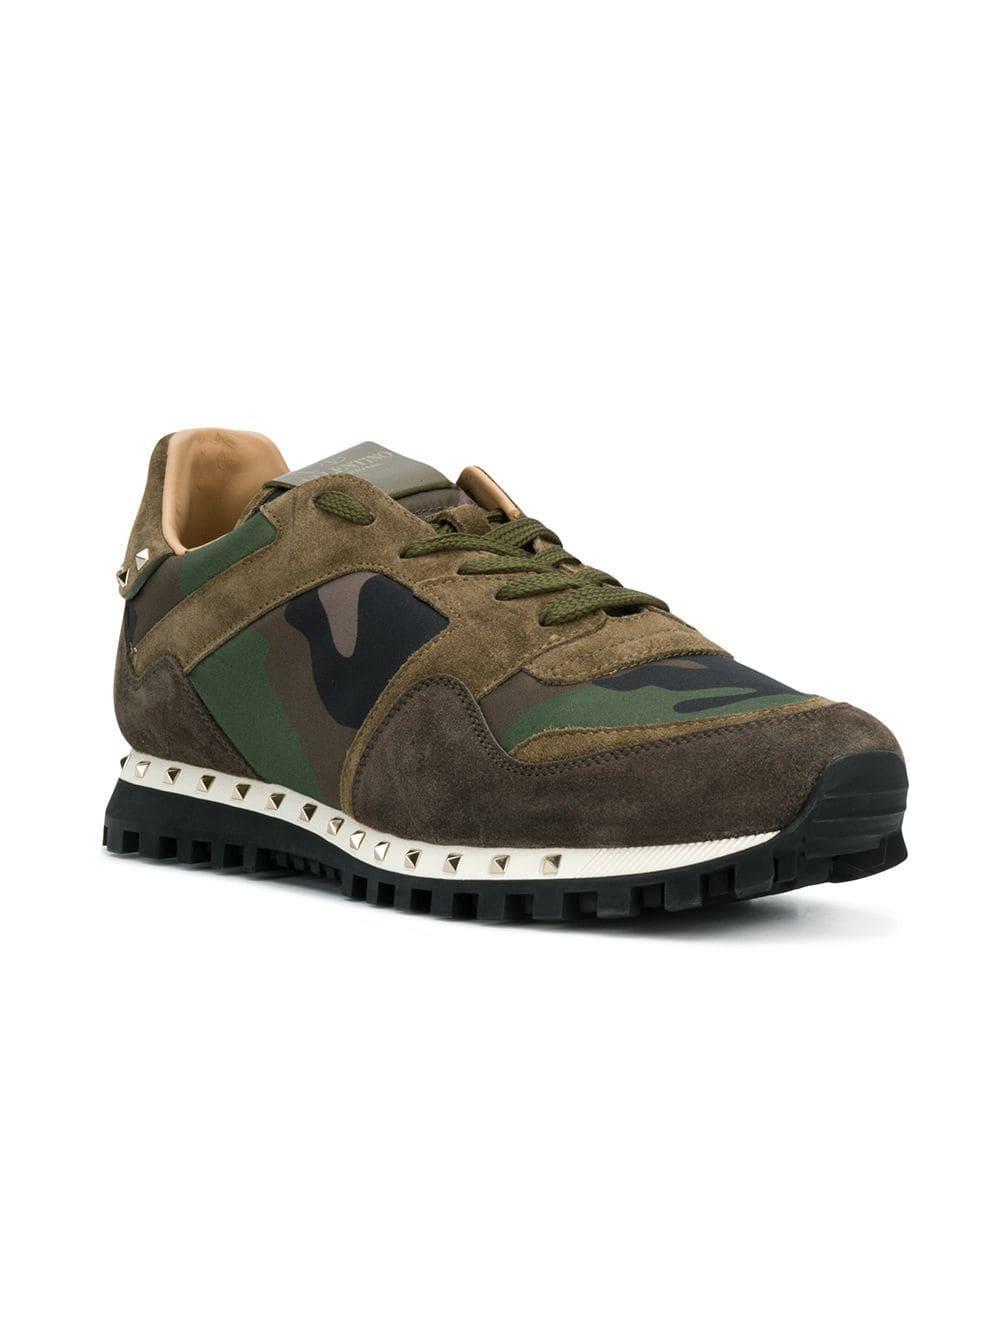 f8becd707ebec Valentino Garavani Soul Rockstud Sneakers in Green for Men - Save 30% - Lyst